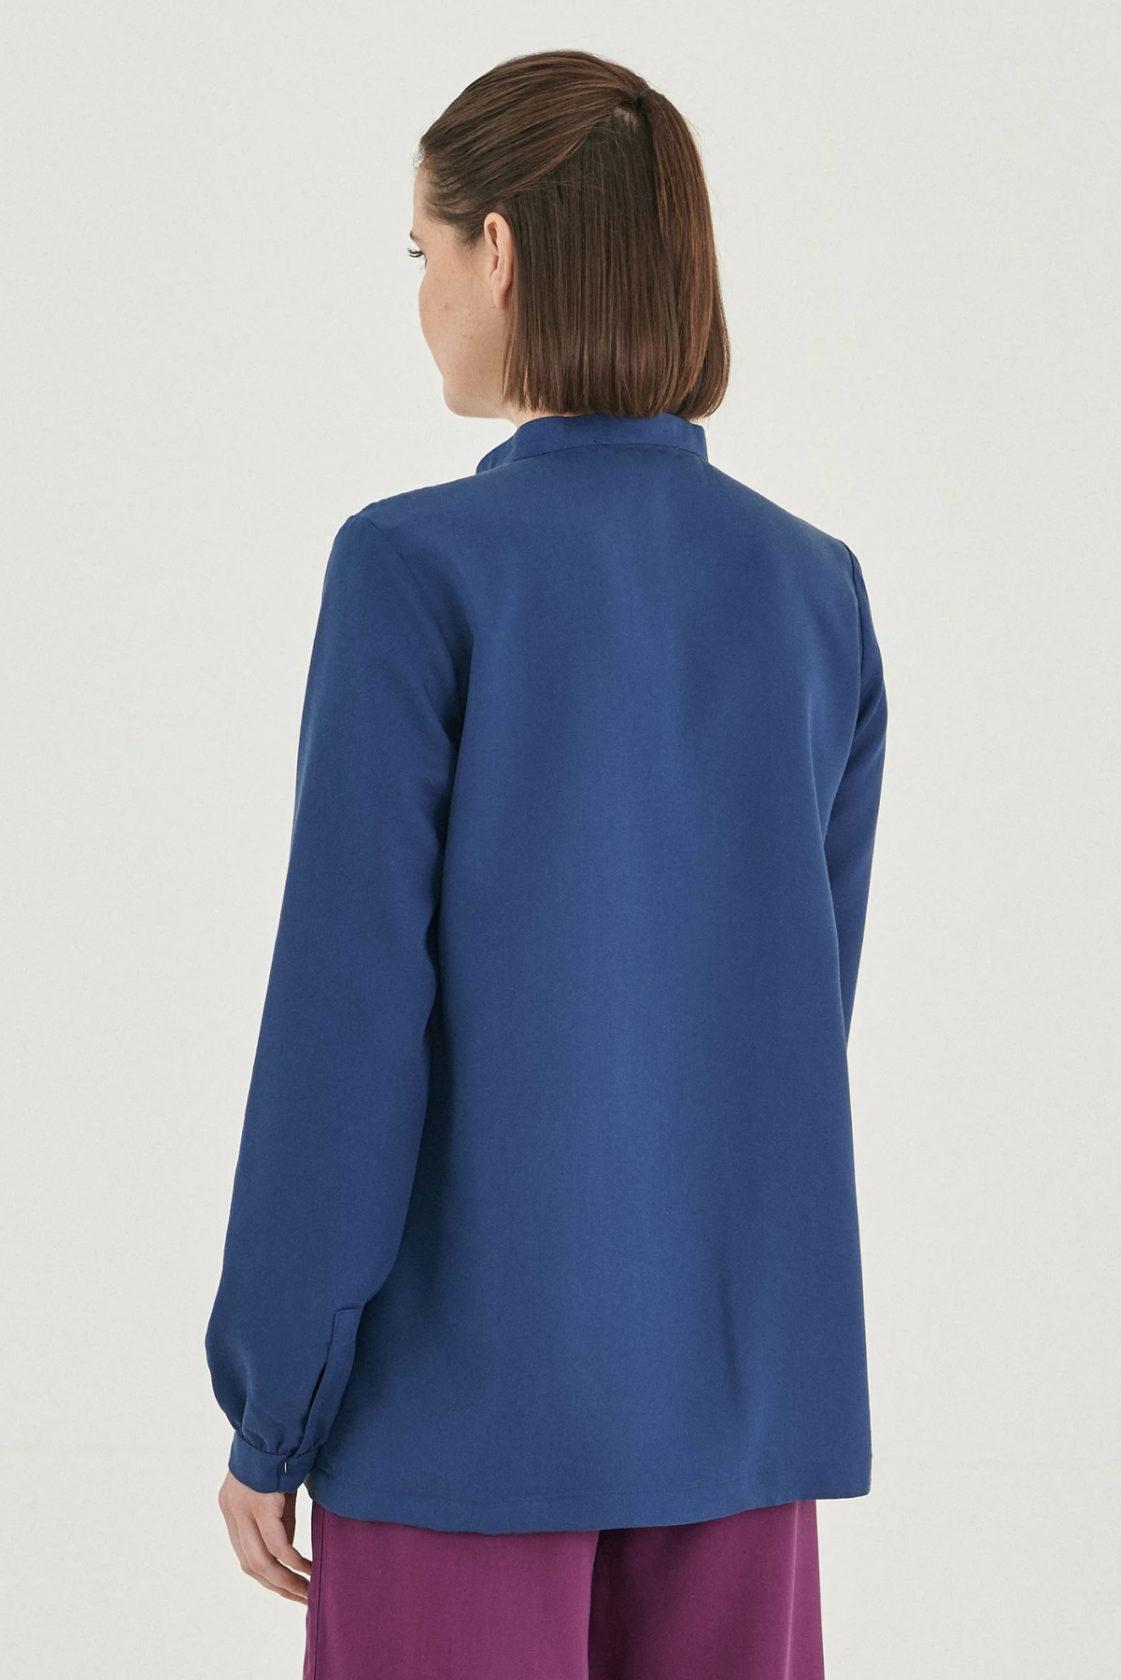 Roberta Organic Fashion Organication Bluse Blau 3